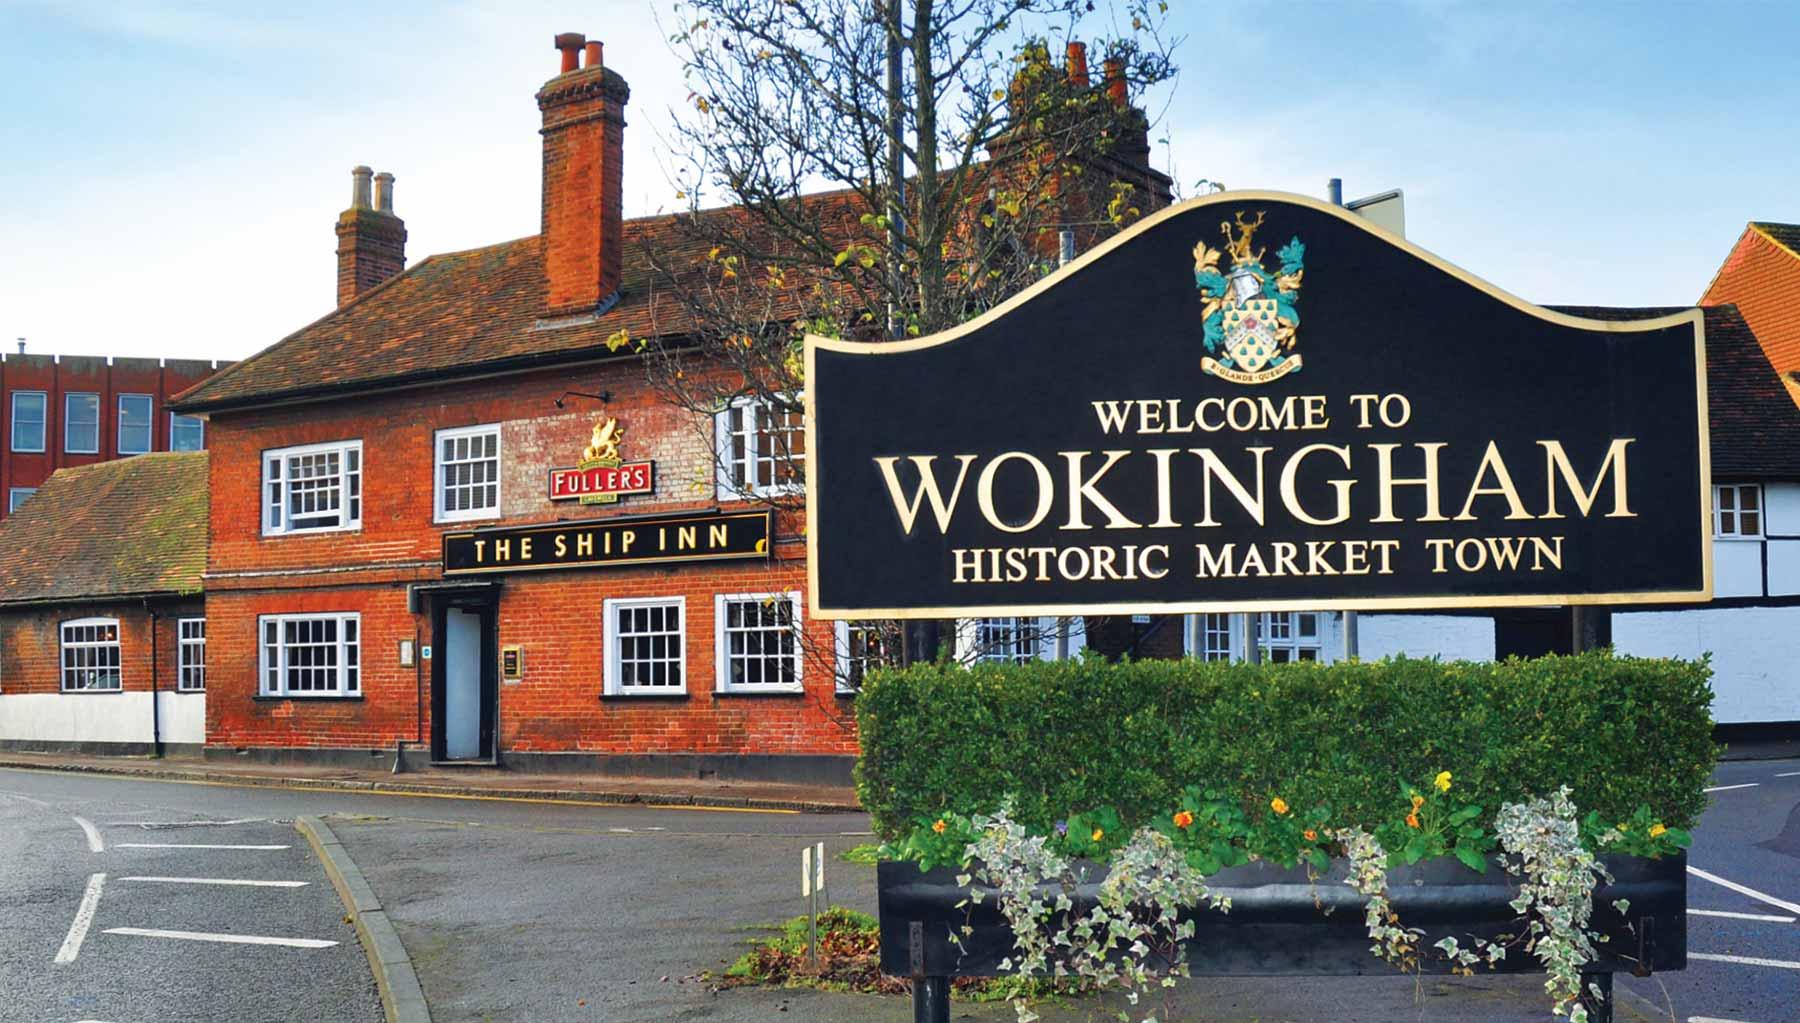 Wokingham Market Town